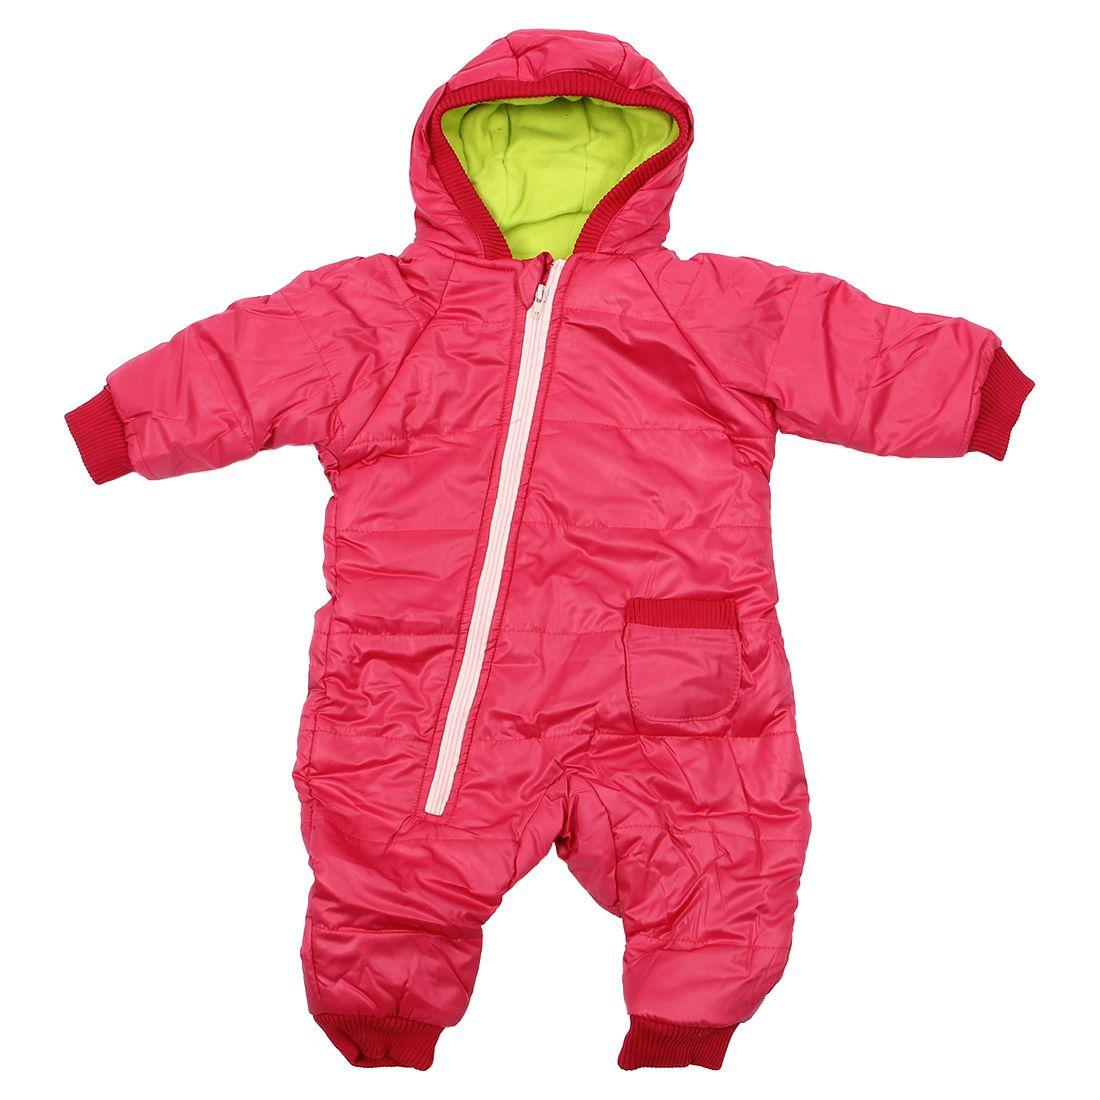 Winter Baby Girl Boy Kid Toddler Snowsuit Coat Jacket Jumper Outwear Clothes 1PC